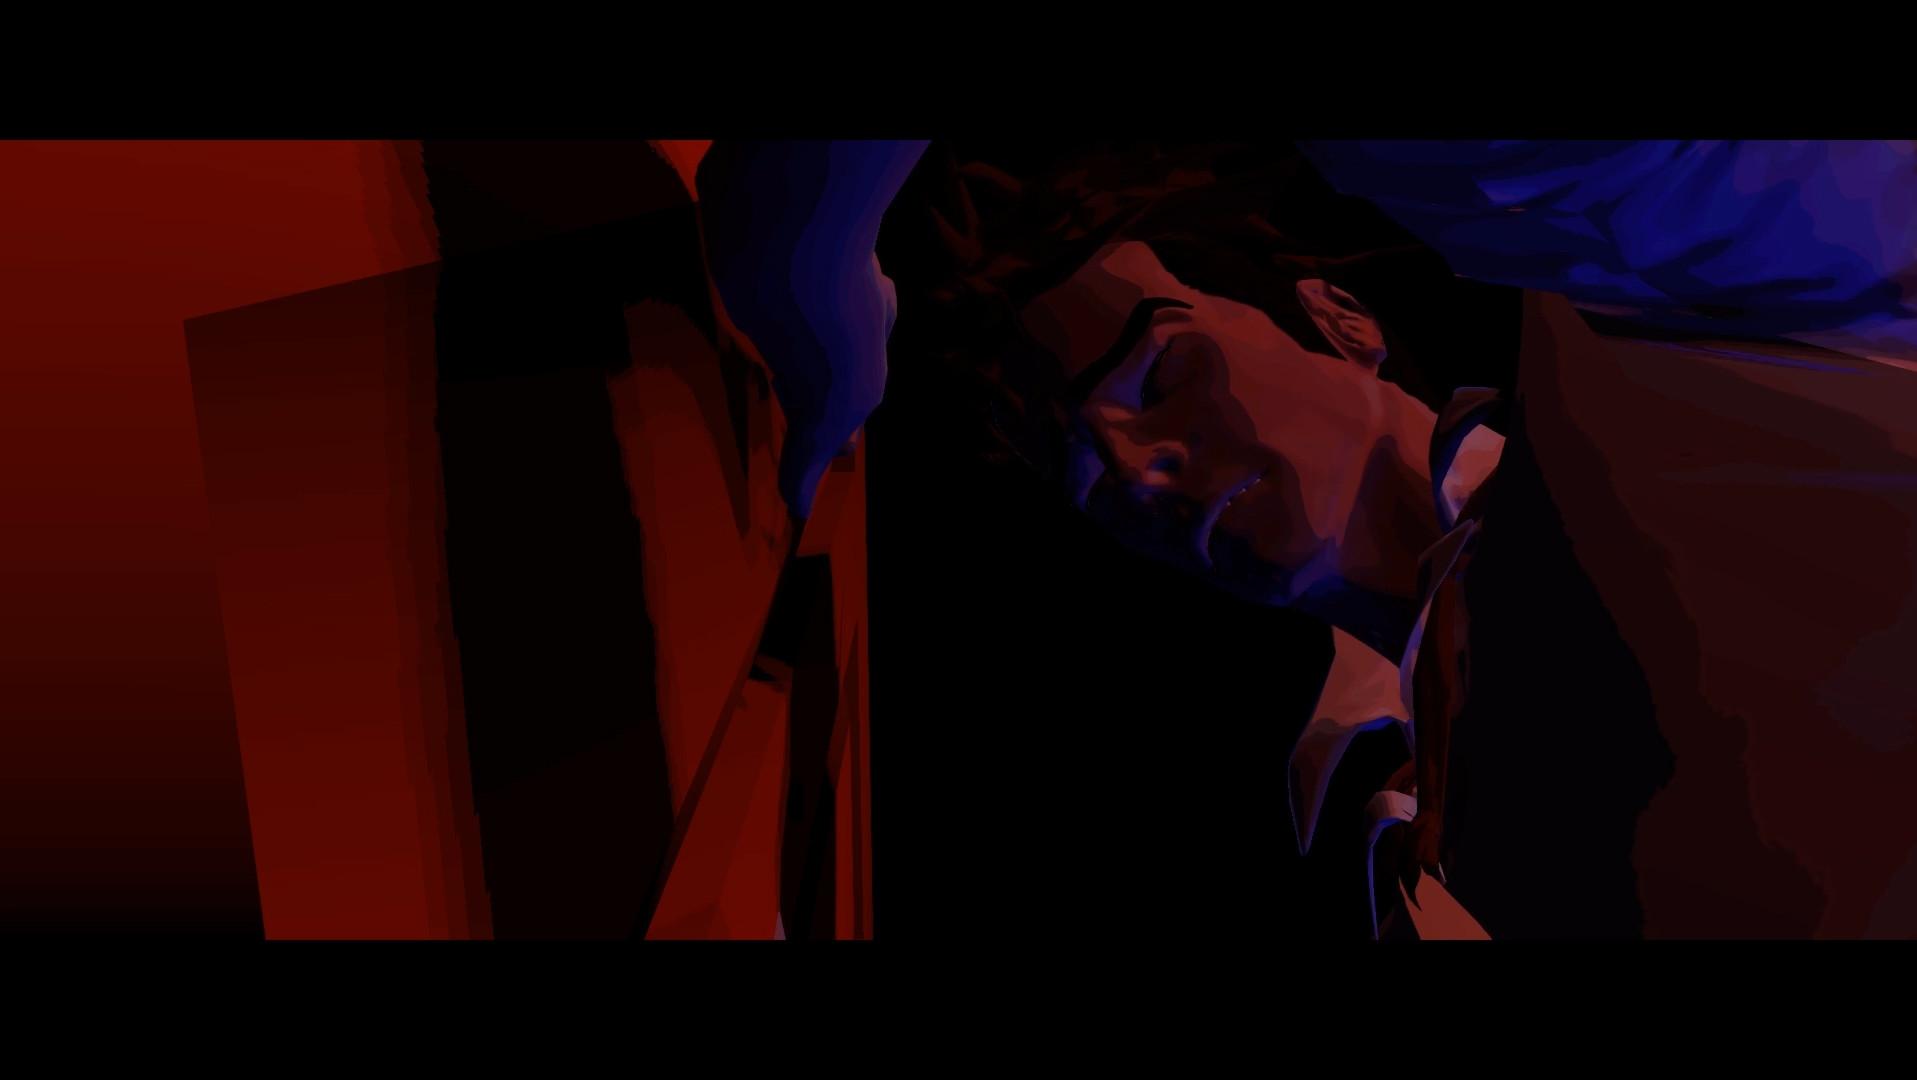 Joseph bramlett untitled 1 0227 layer 45